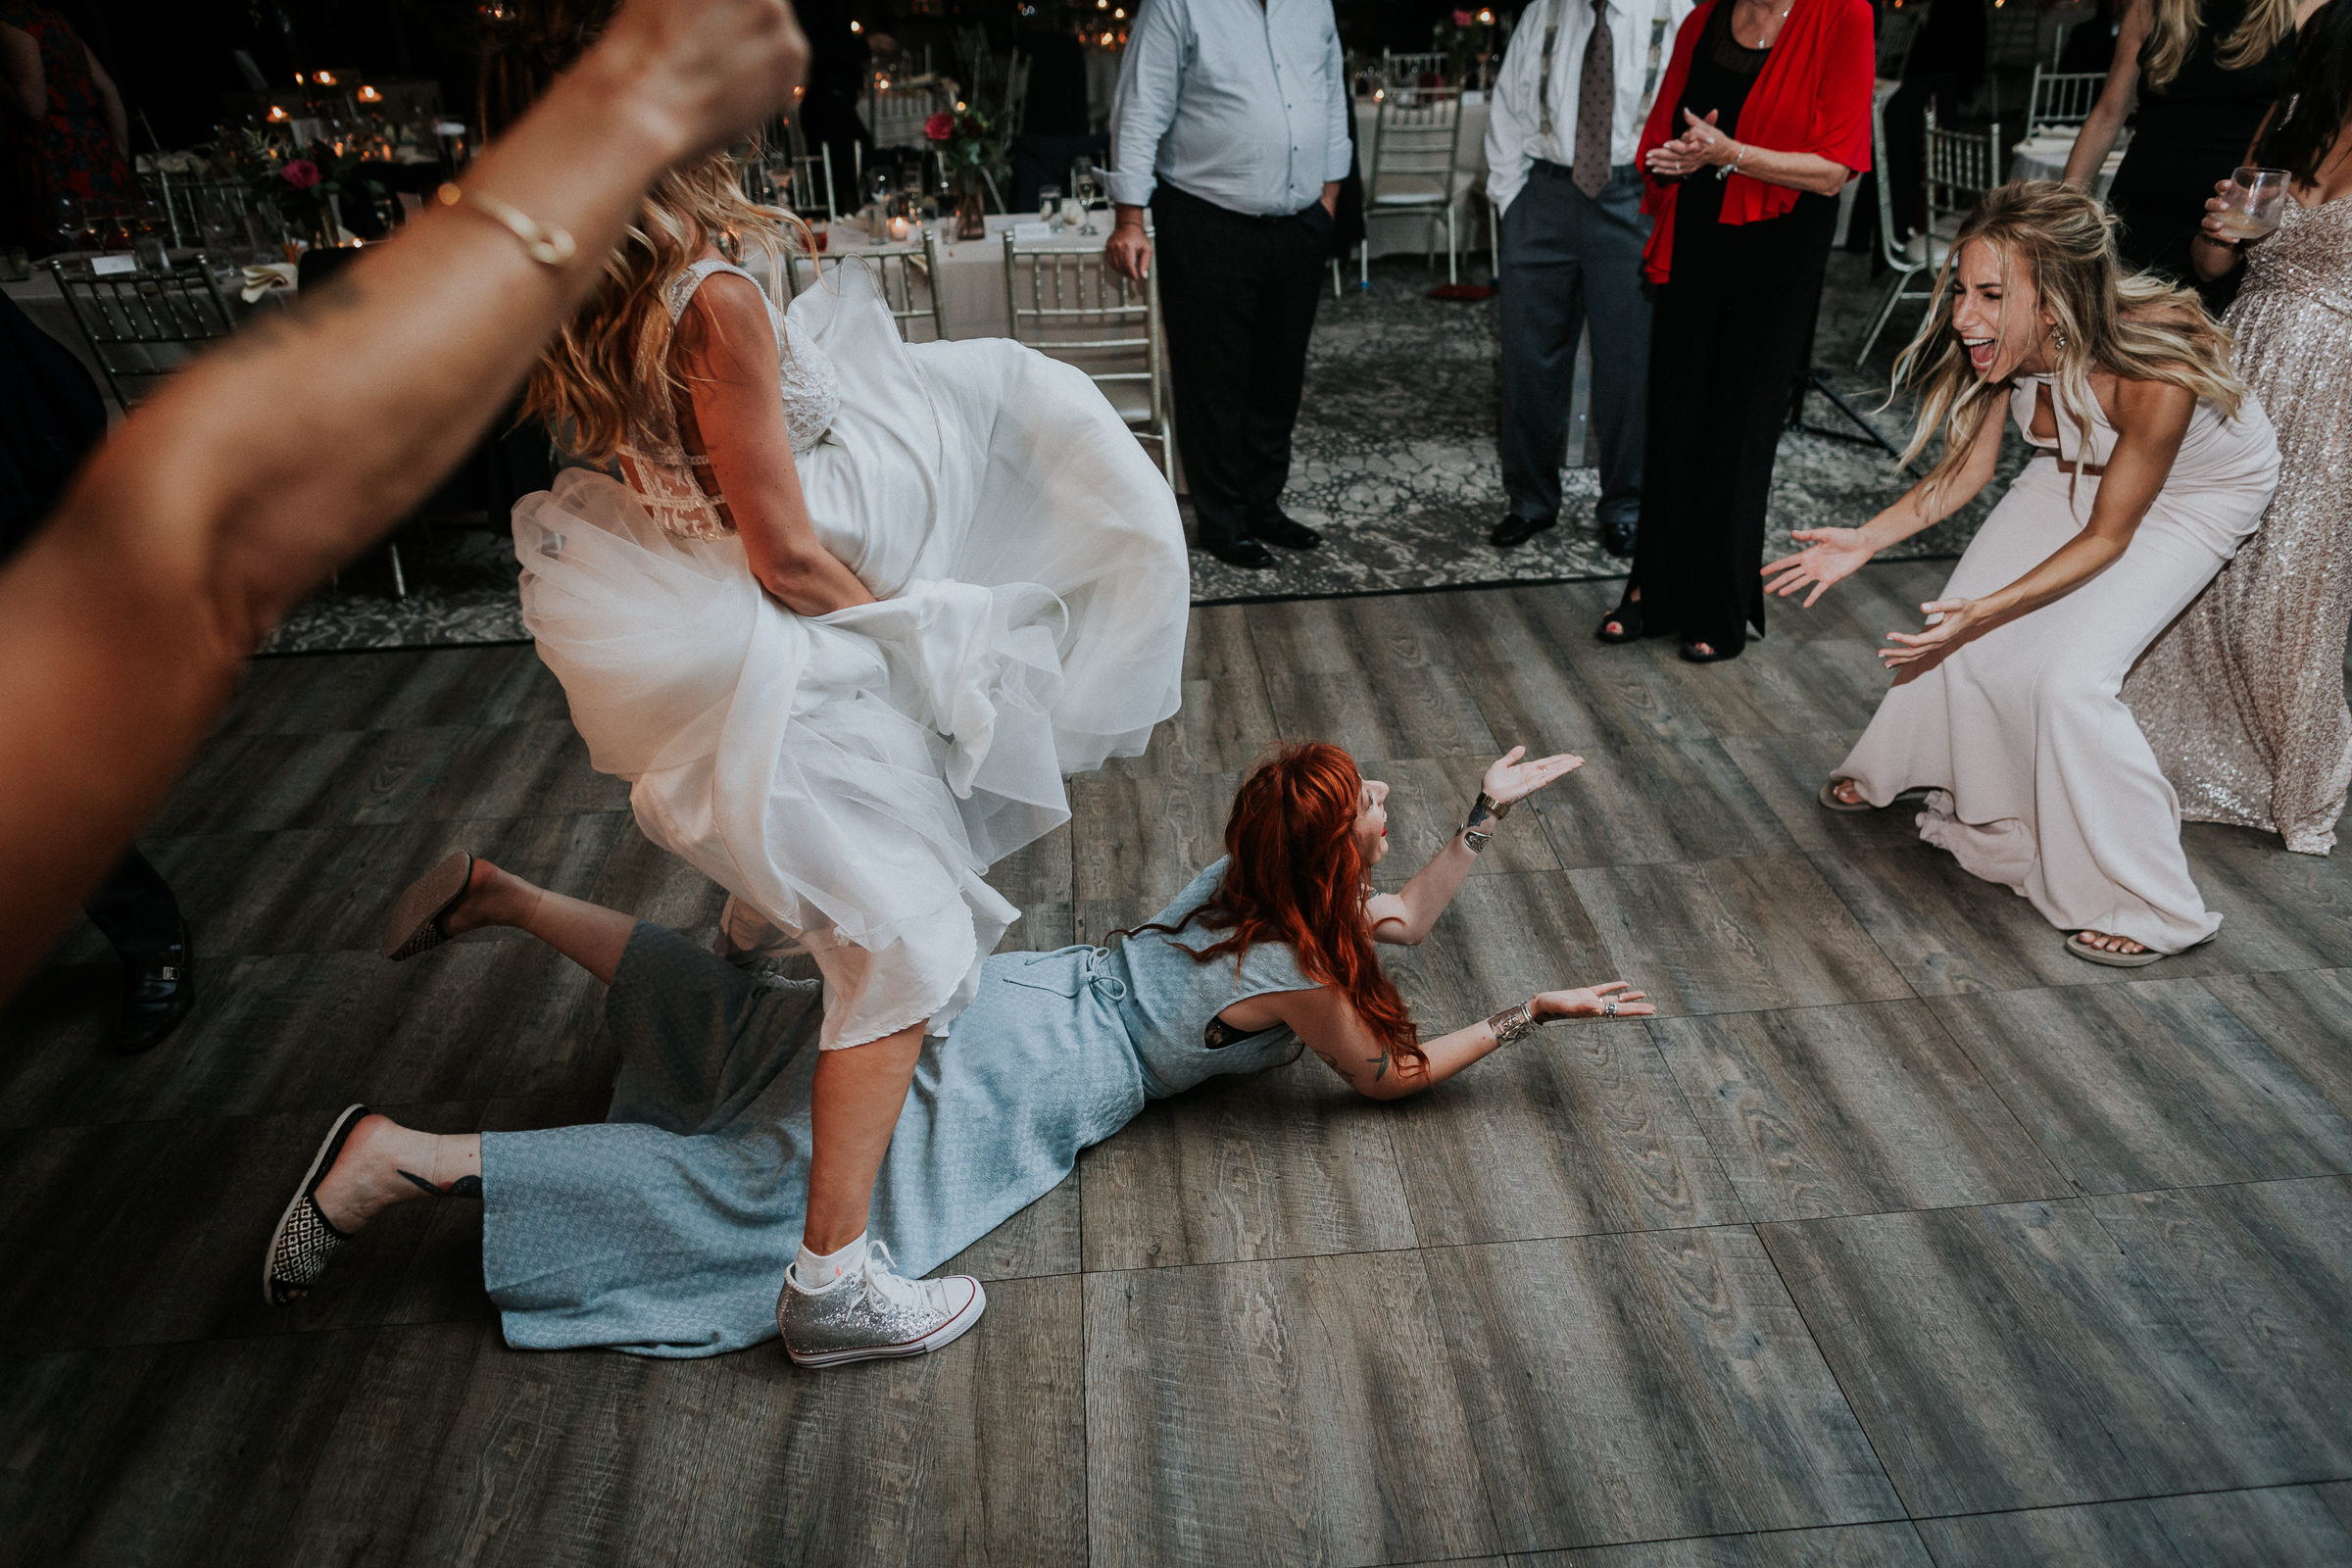 Ravel-Hotel-Penthouse-808-Long-Island-City-New-York-Documentary-Wedding-Photographer-113.jpg